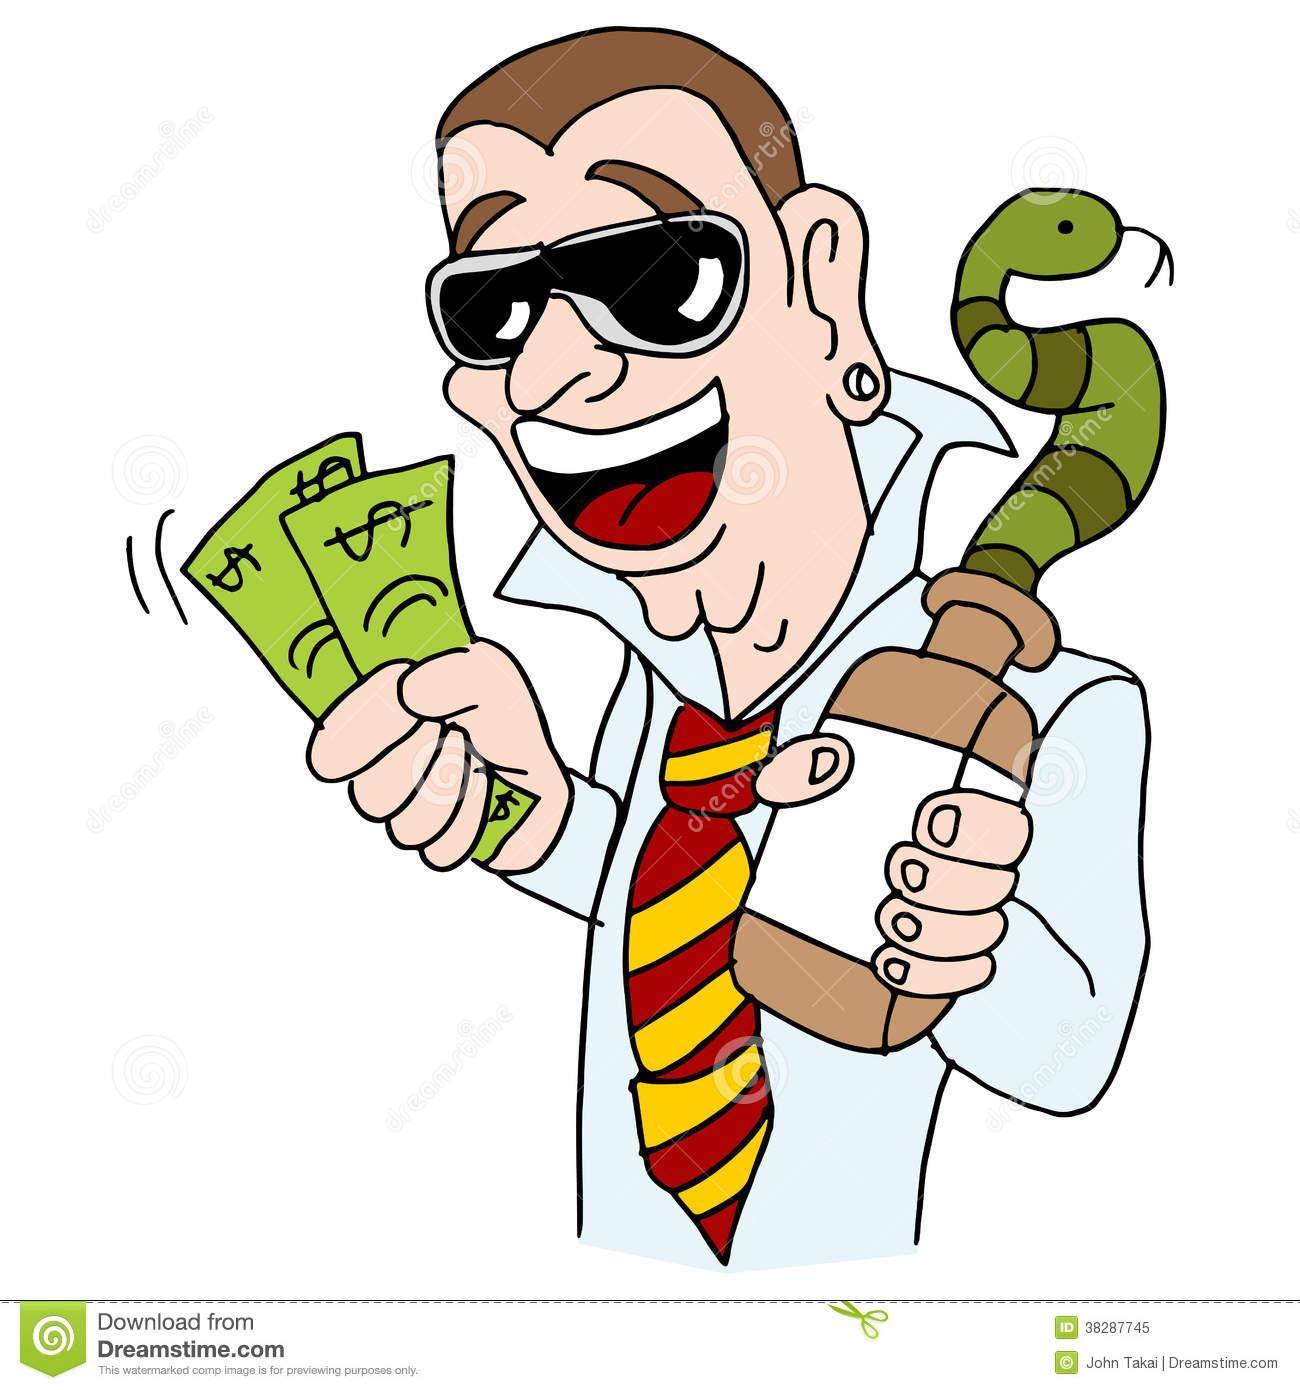 salesman-clipart-snake-oil-salesman-image-con-artist-38287745.jpg